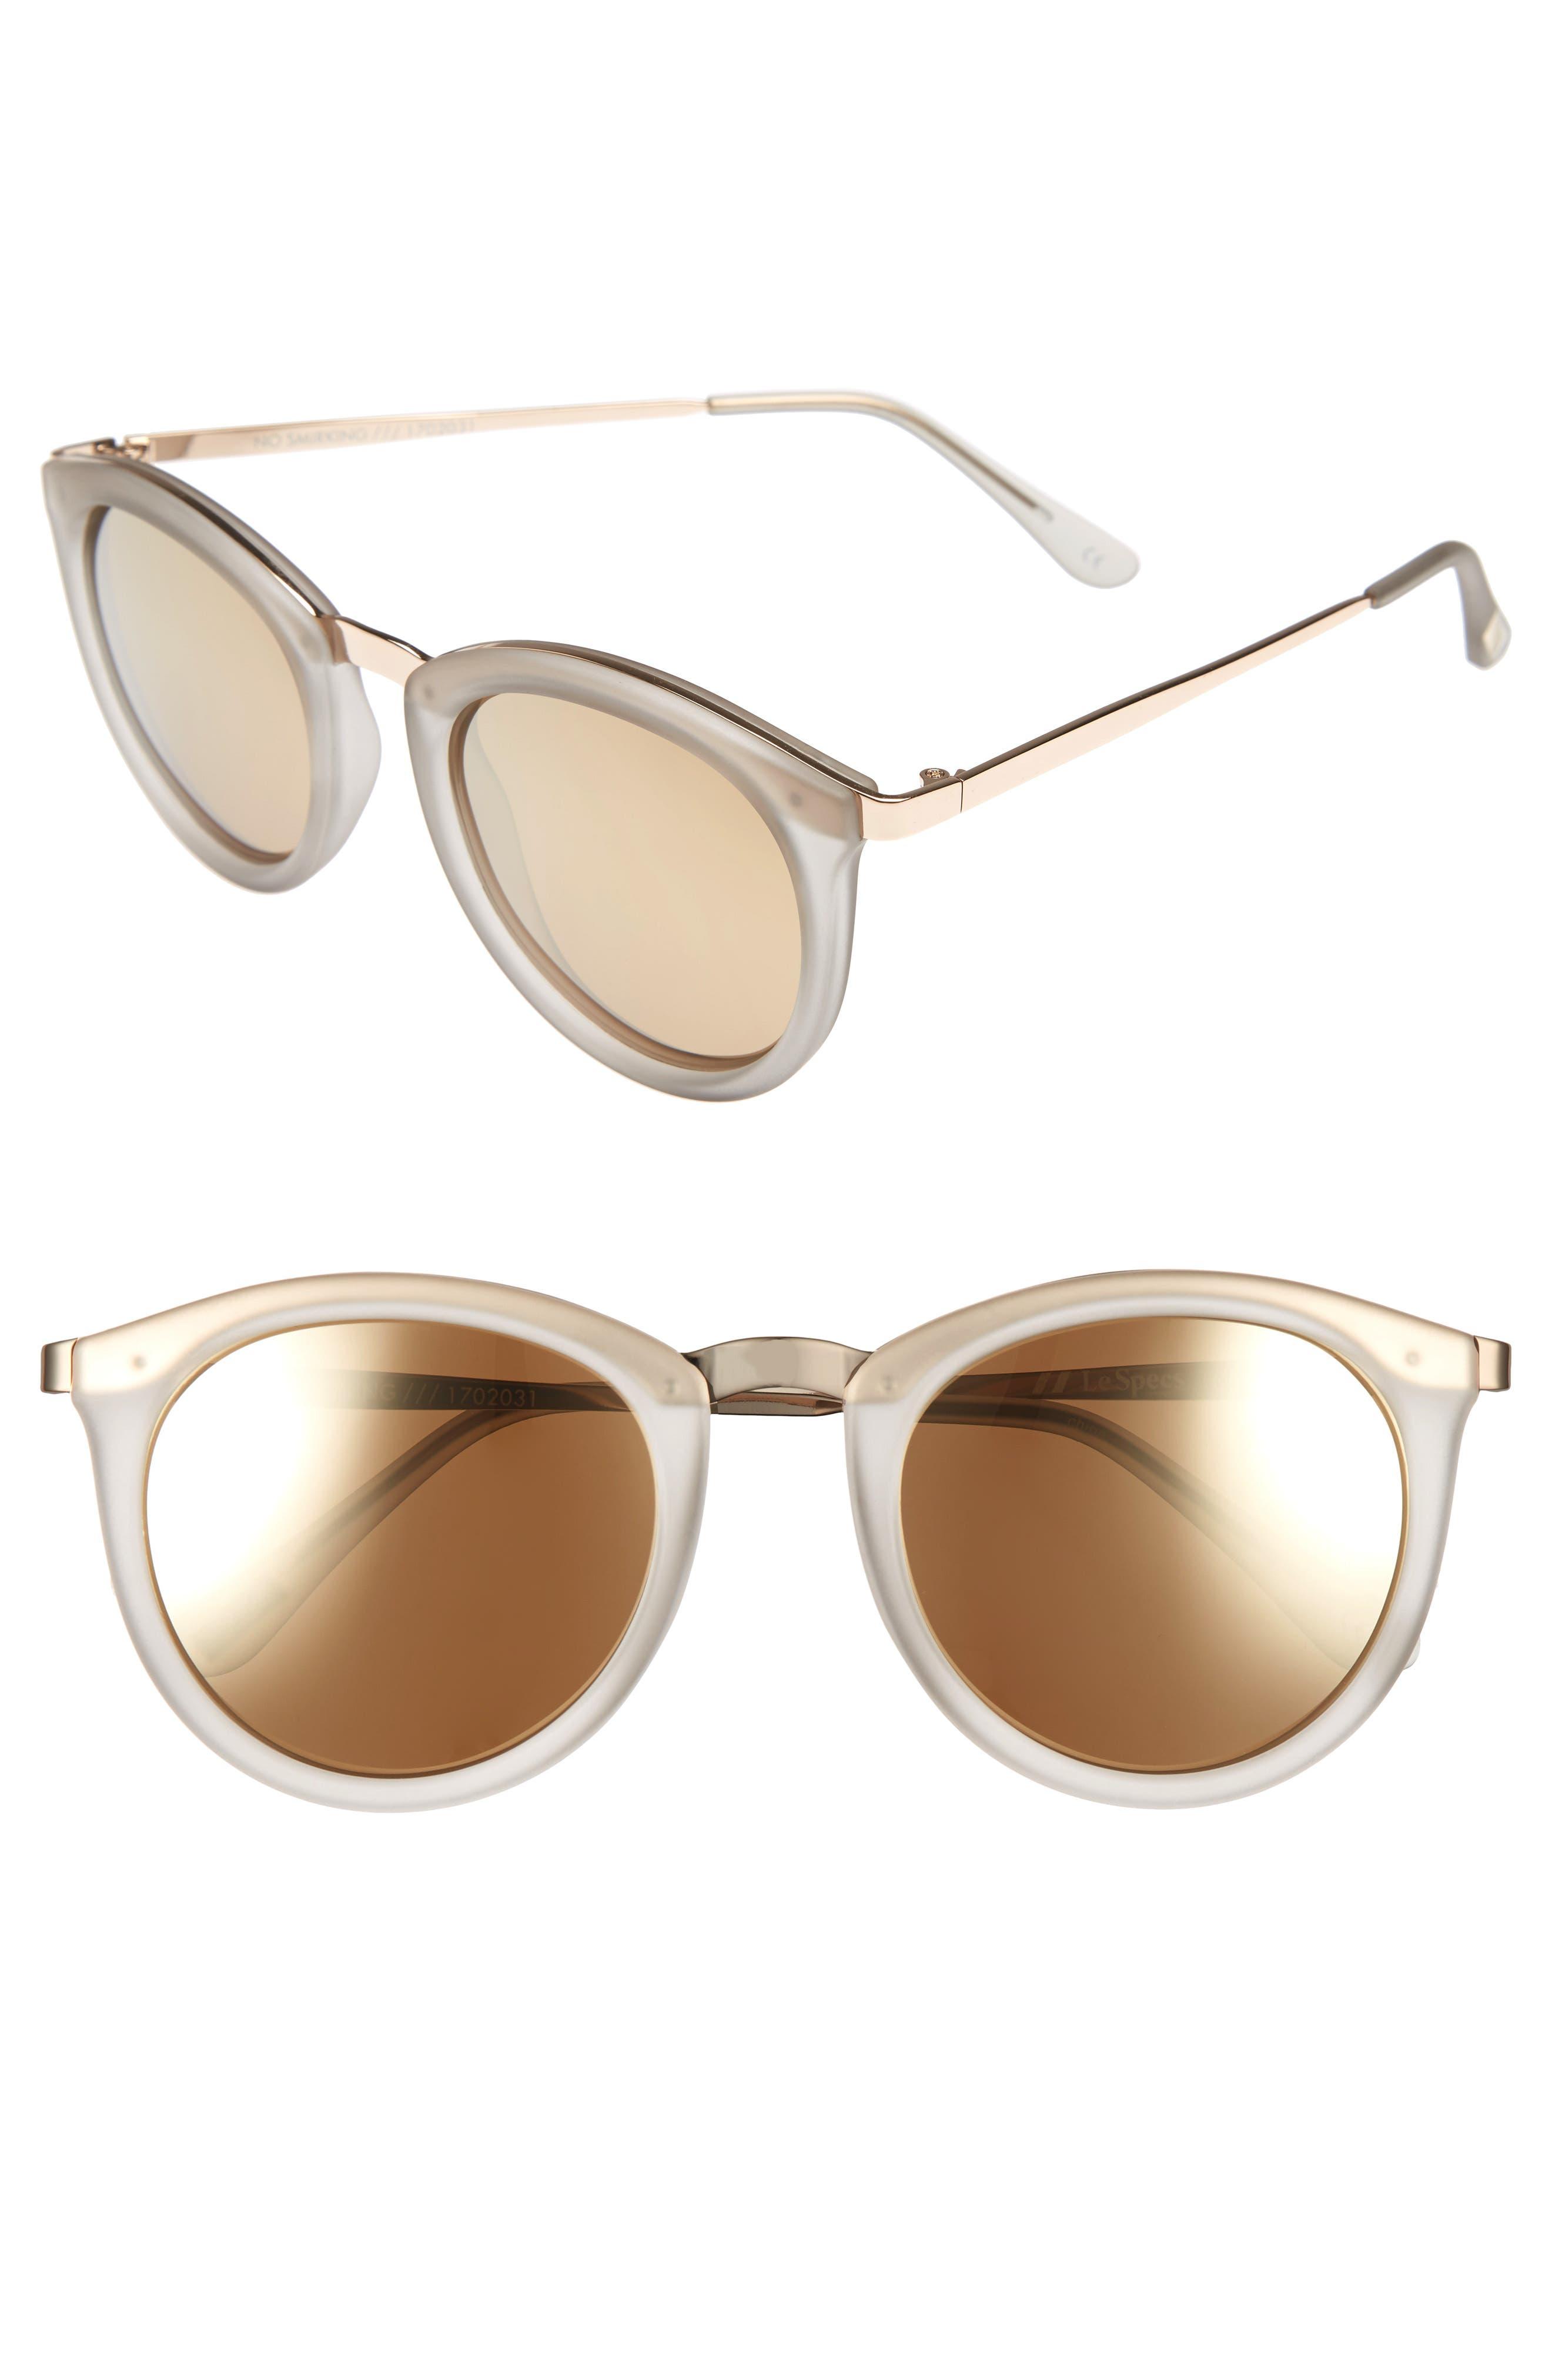 Alternate Image 1 Selected - Le Specs No Smirking 50mm Polarized Sunglasses